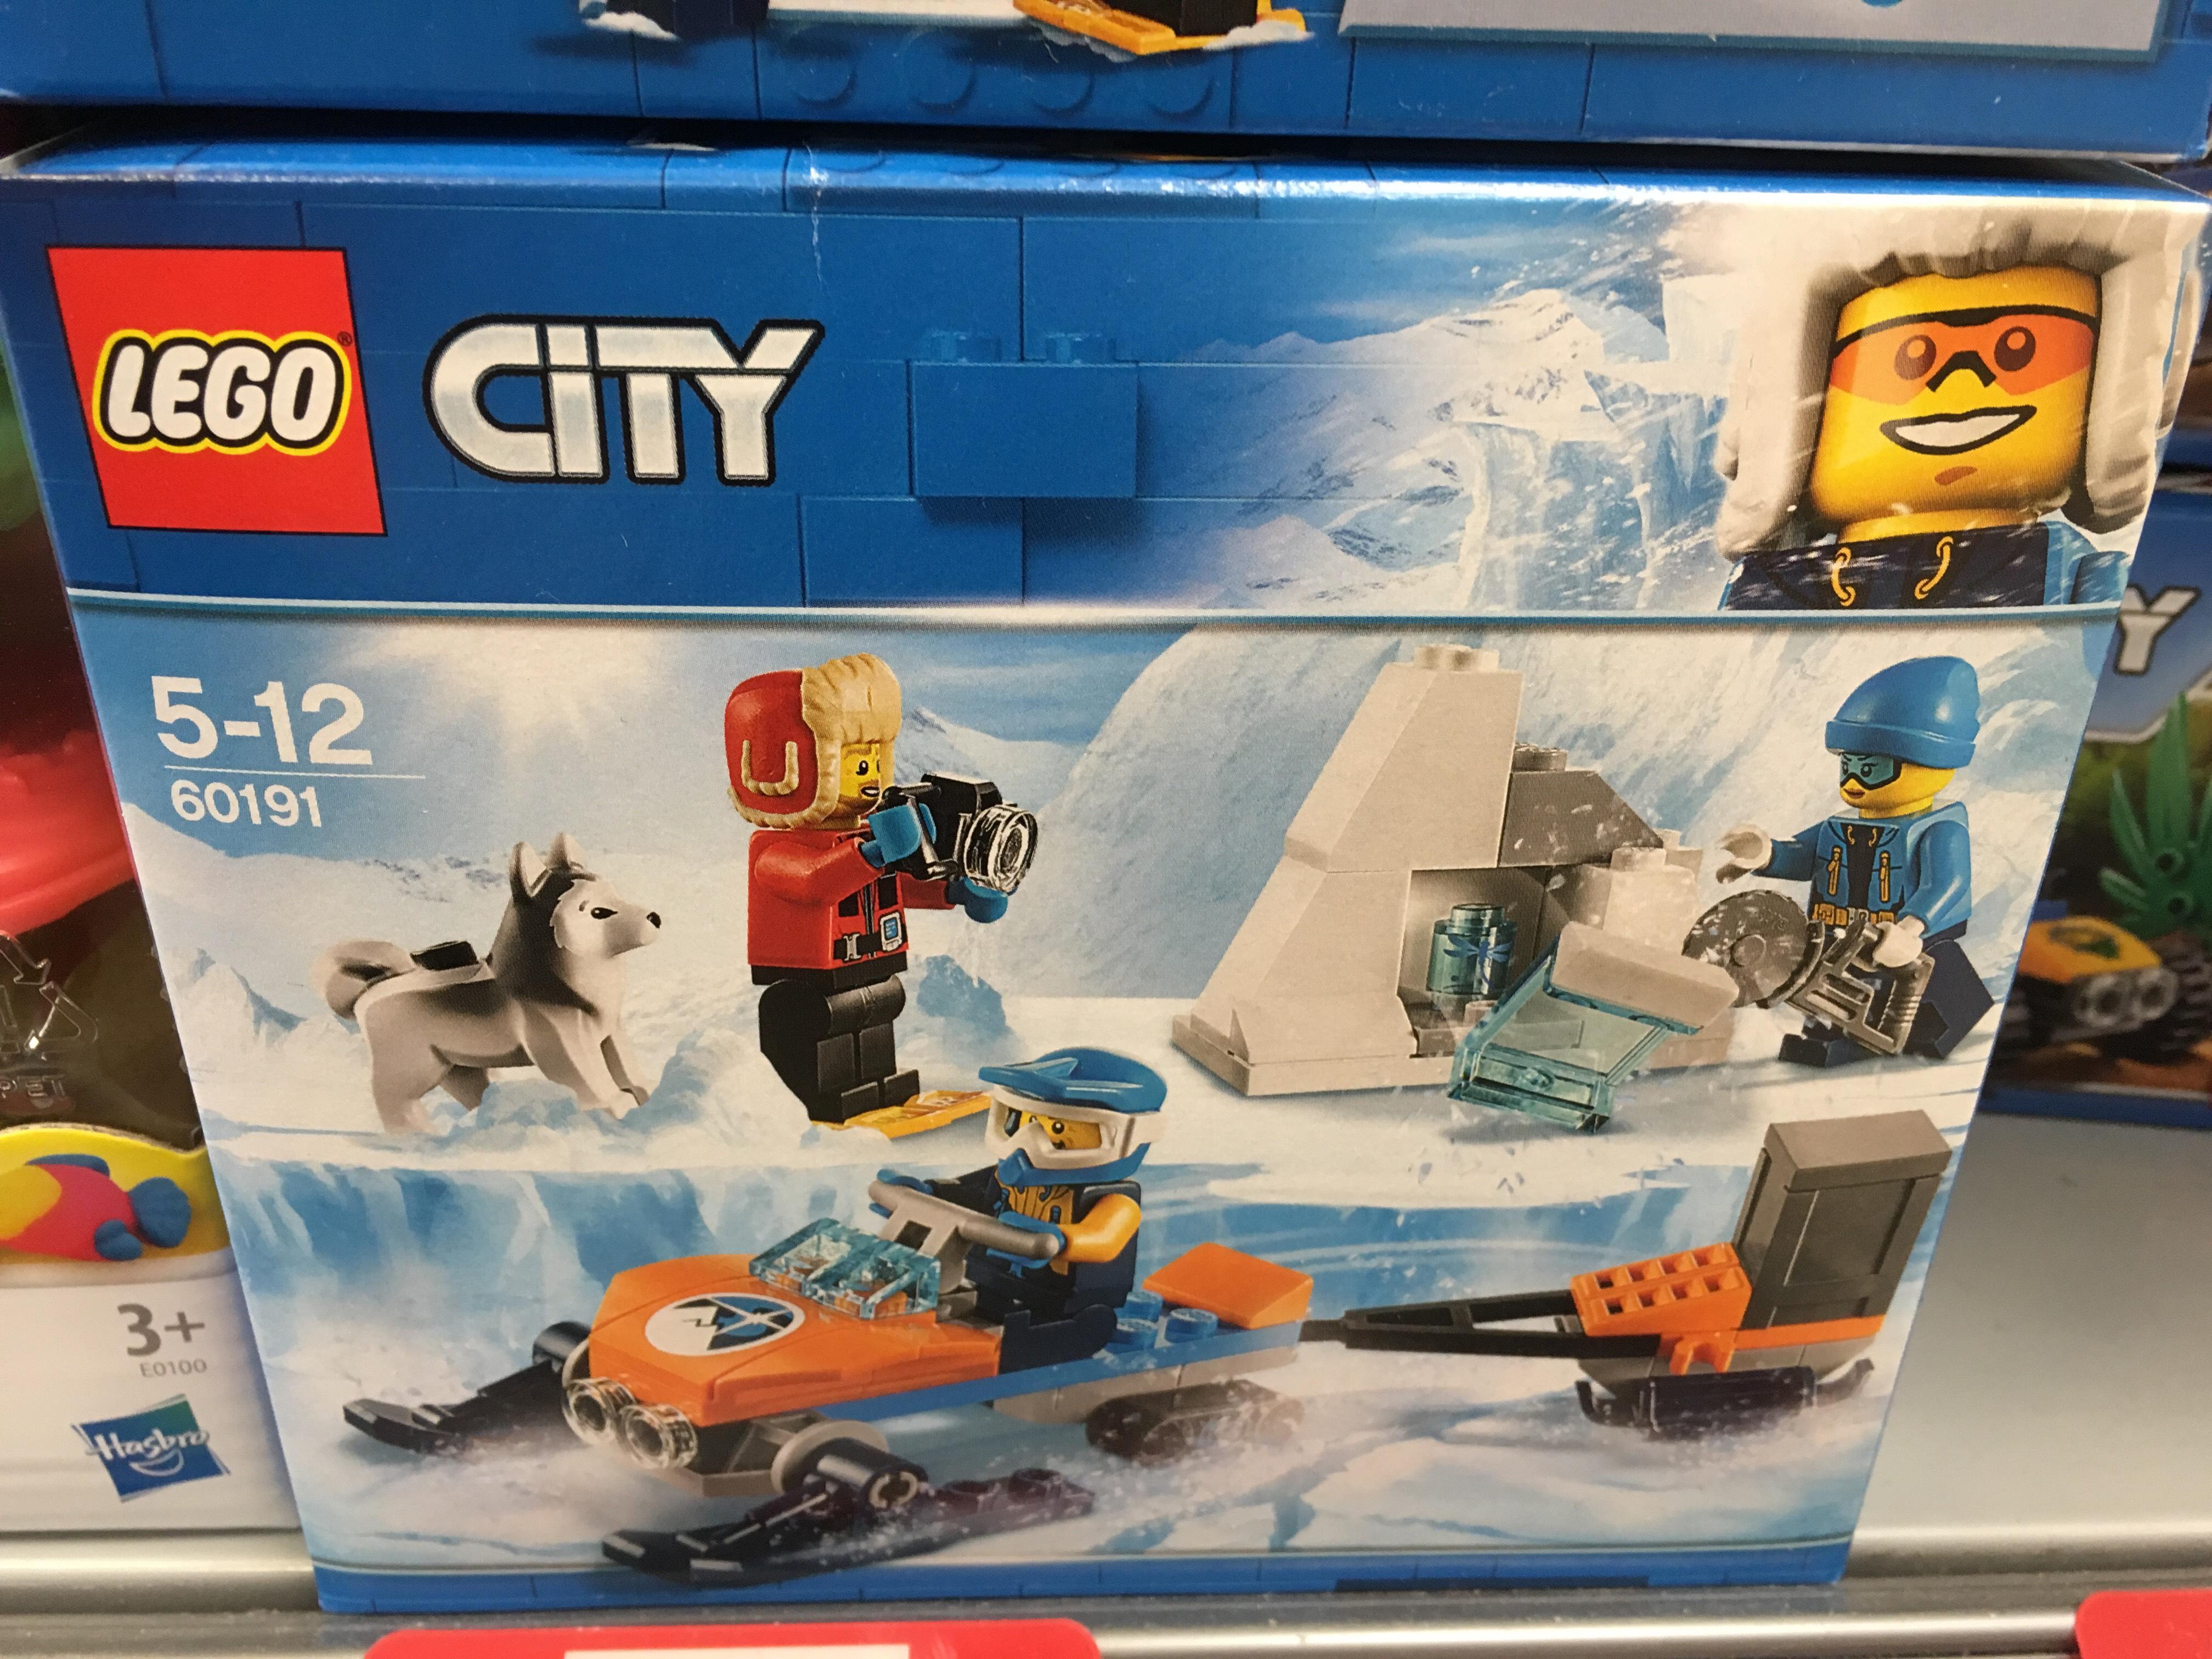 INSTORE @ COOP in NORTON - Lego 60191 City Arctic Expo Team £8